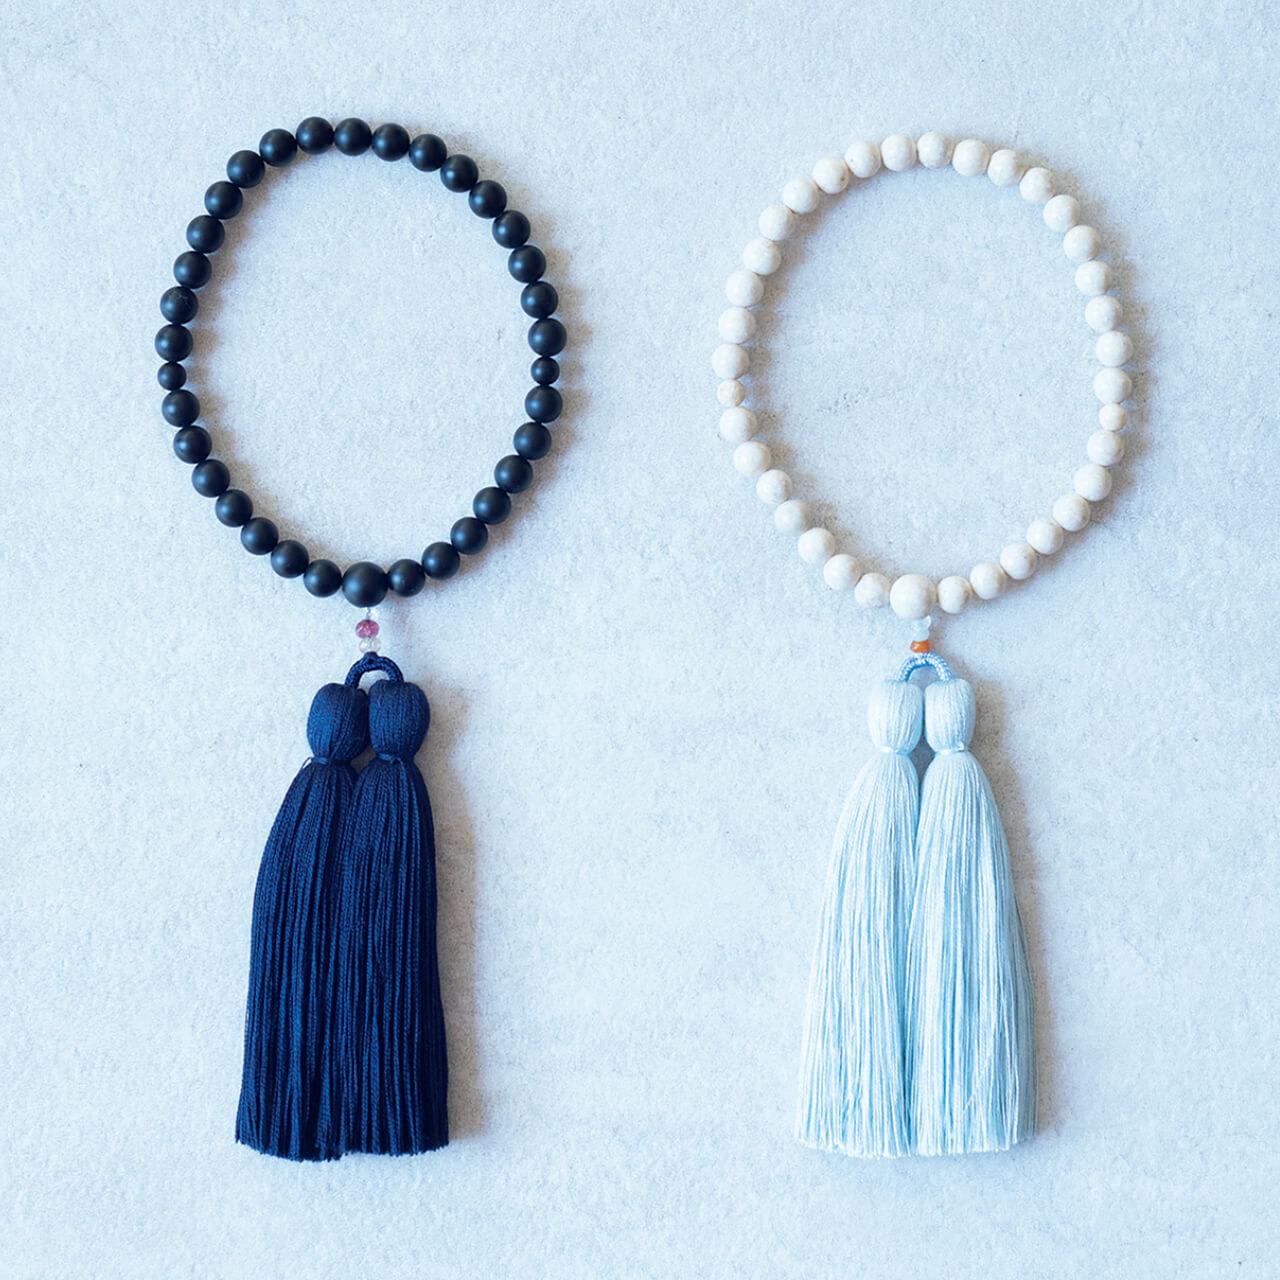 Shuó シュオ 数珠